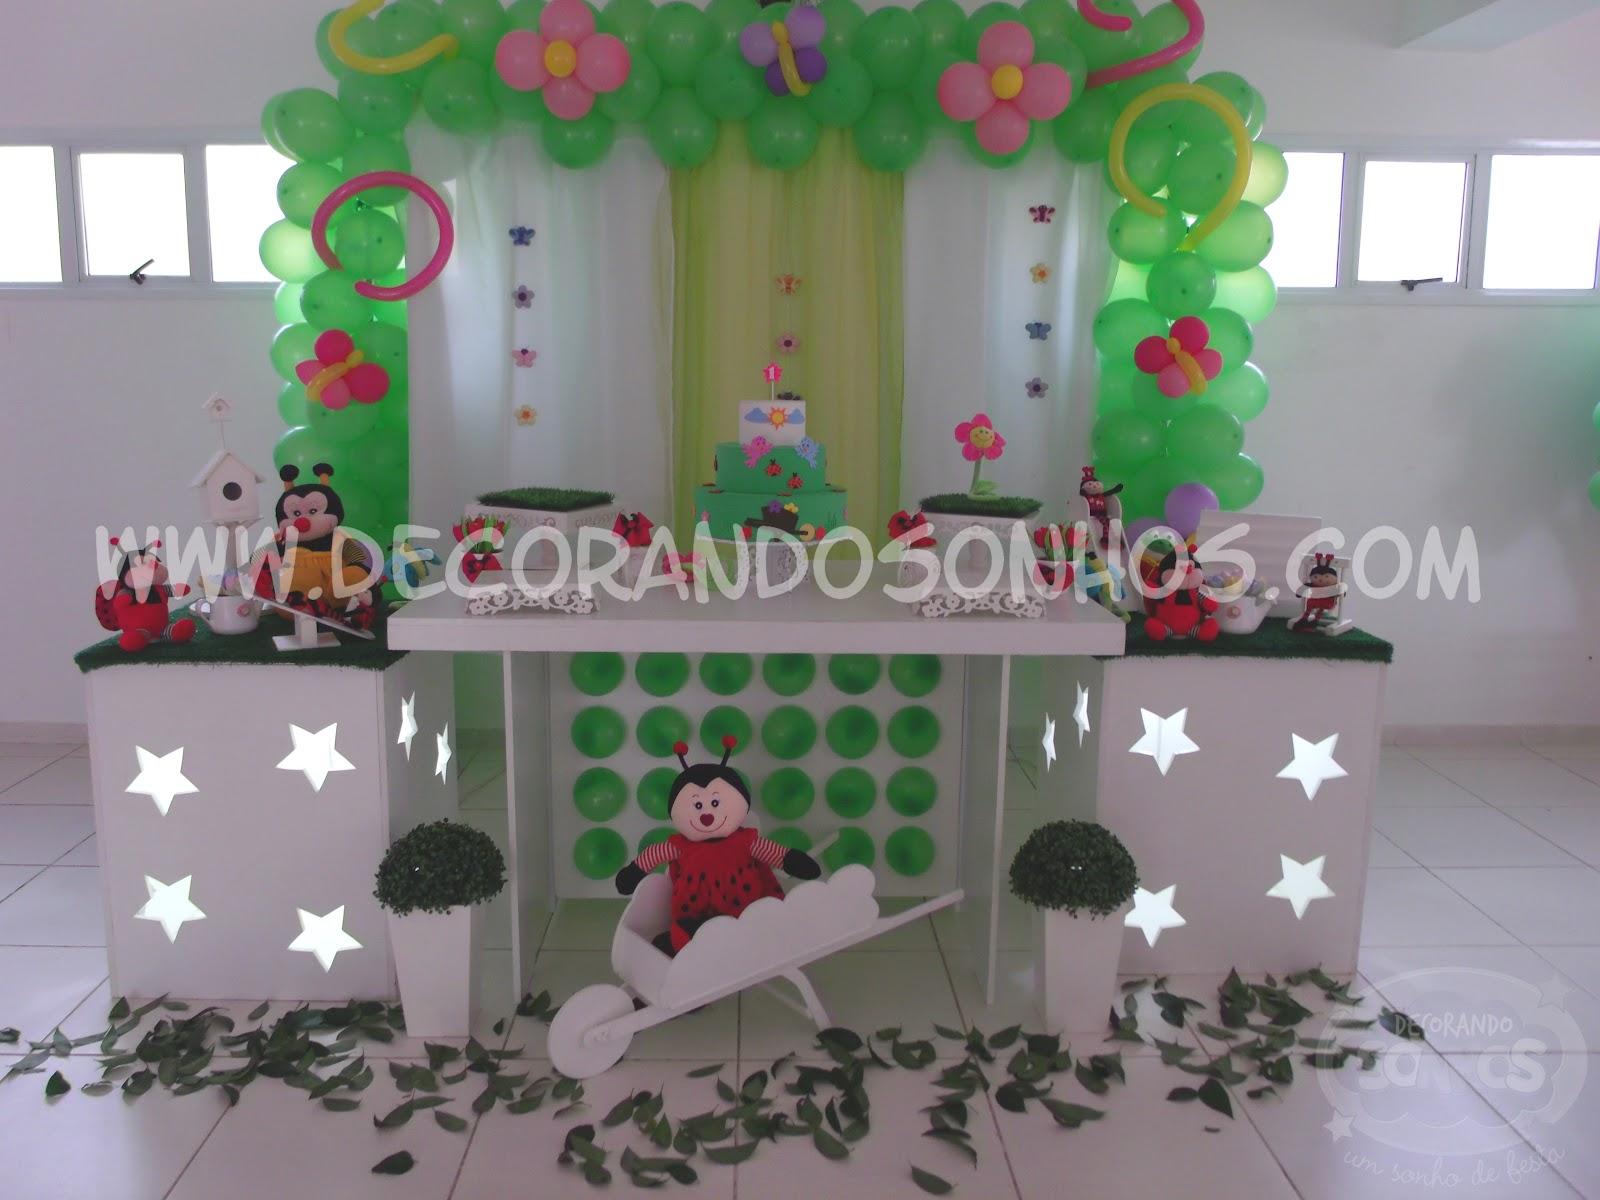 jardim+encantado+decoracao+provencal+jardim+encantado+decoracao+festa